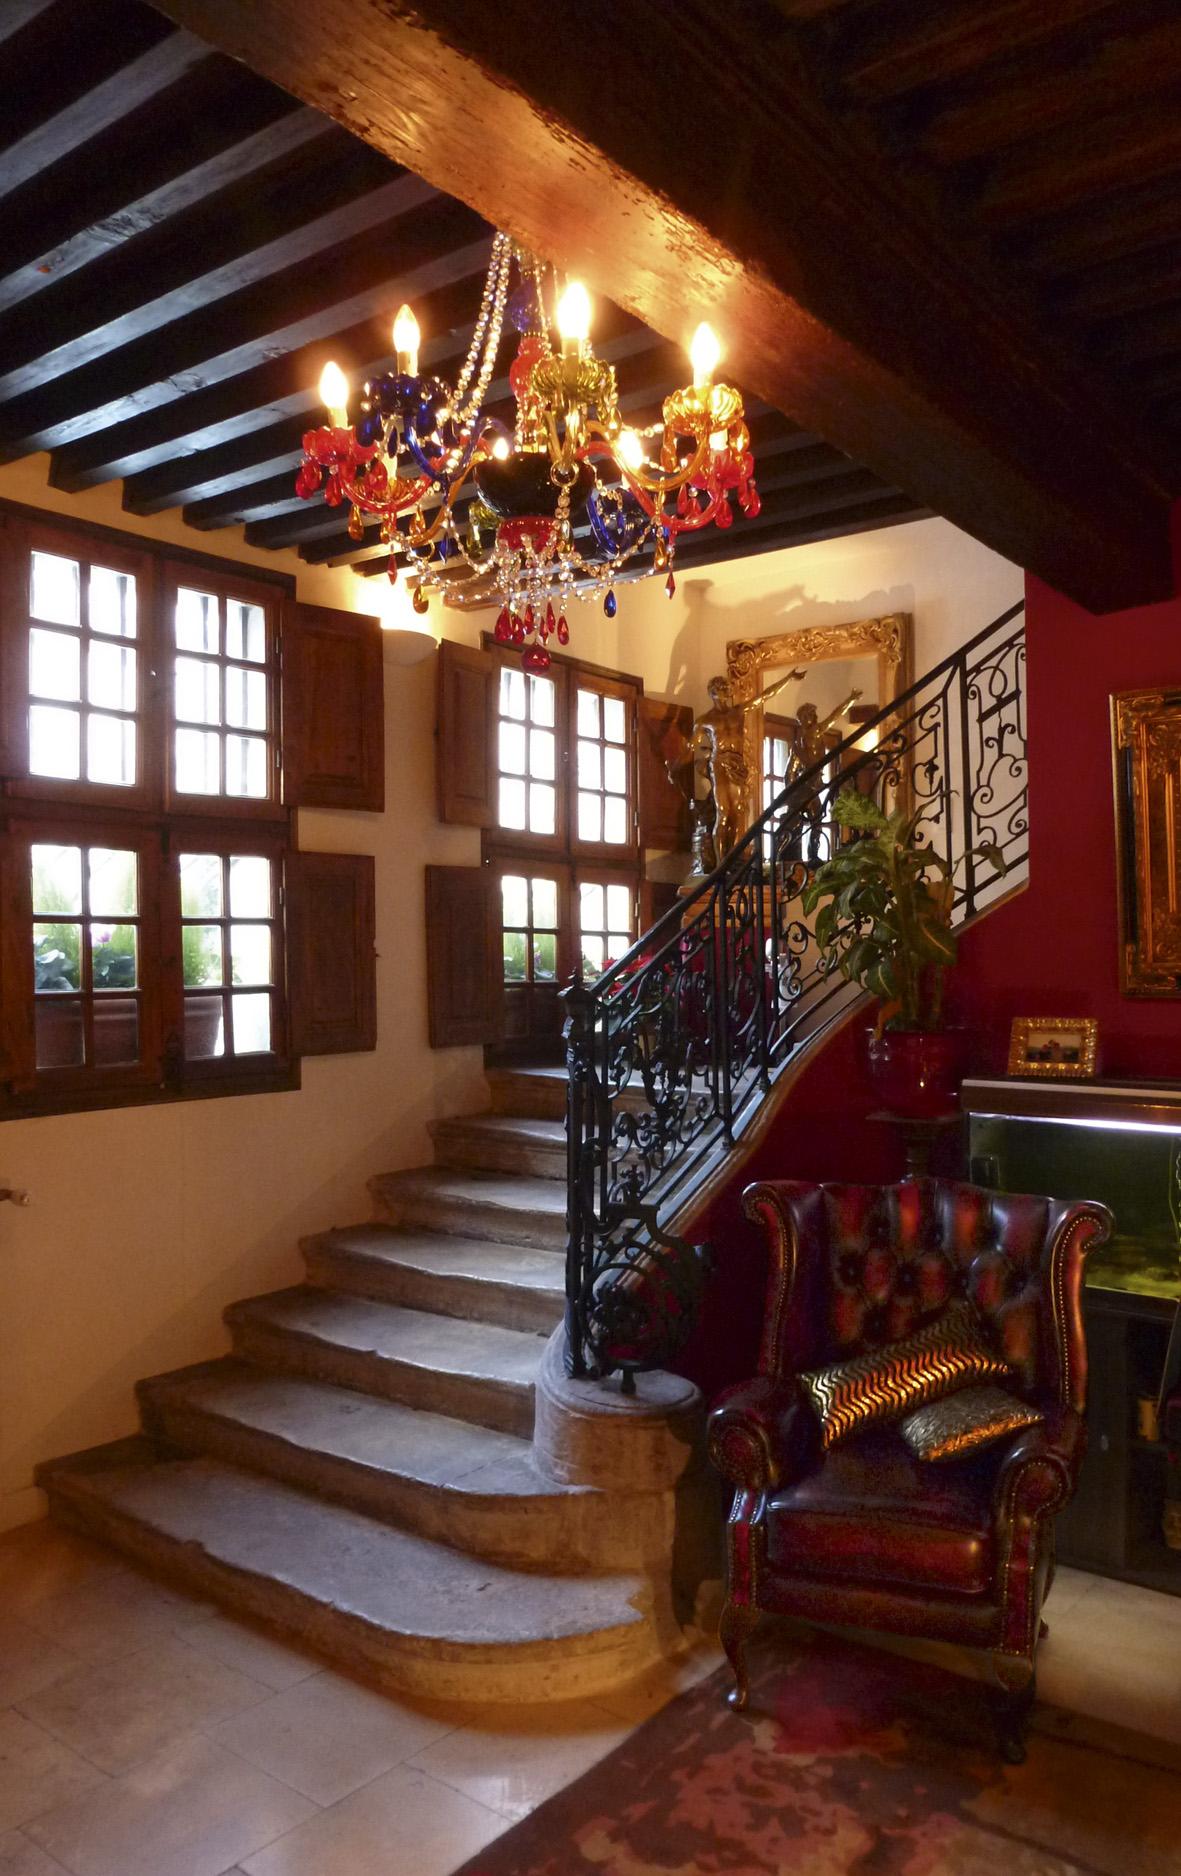 bed and breakfast in provence in villeneuve les avignon les saisons. Black Bedroom Furniture Sets. Home Design Ideas